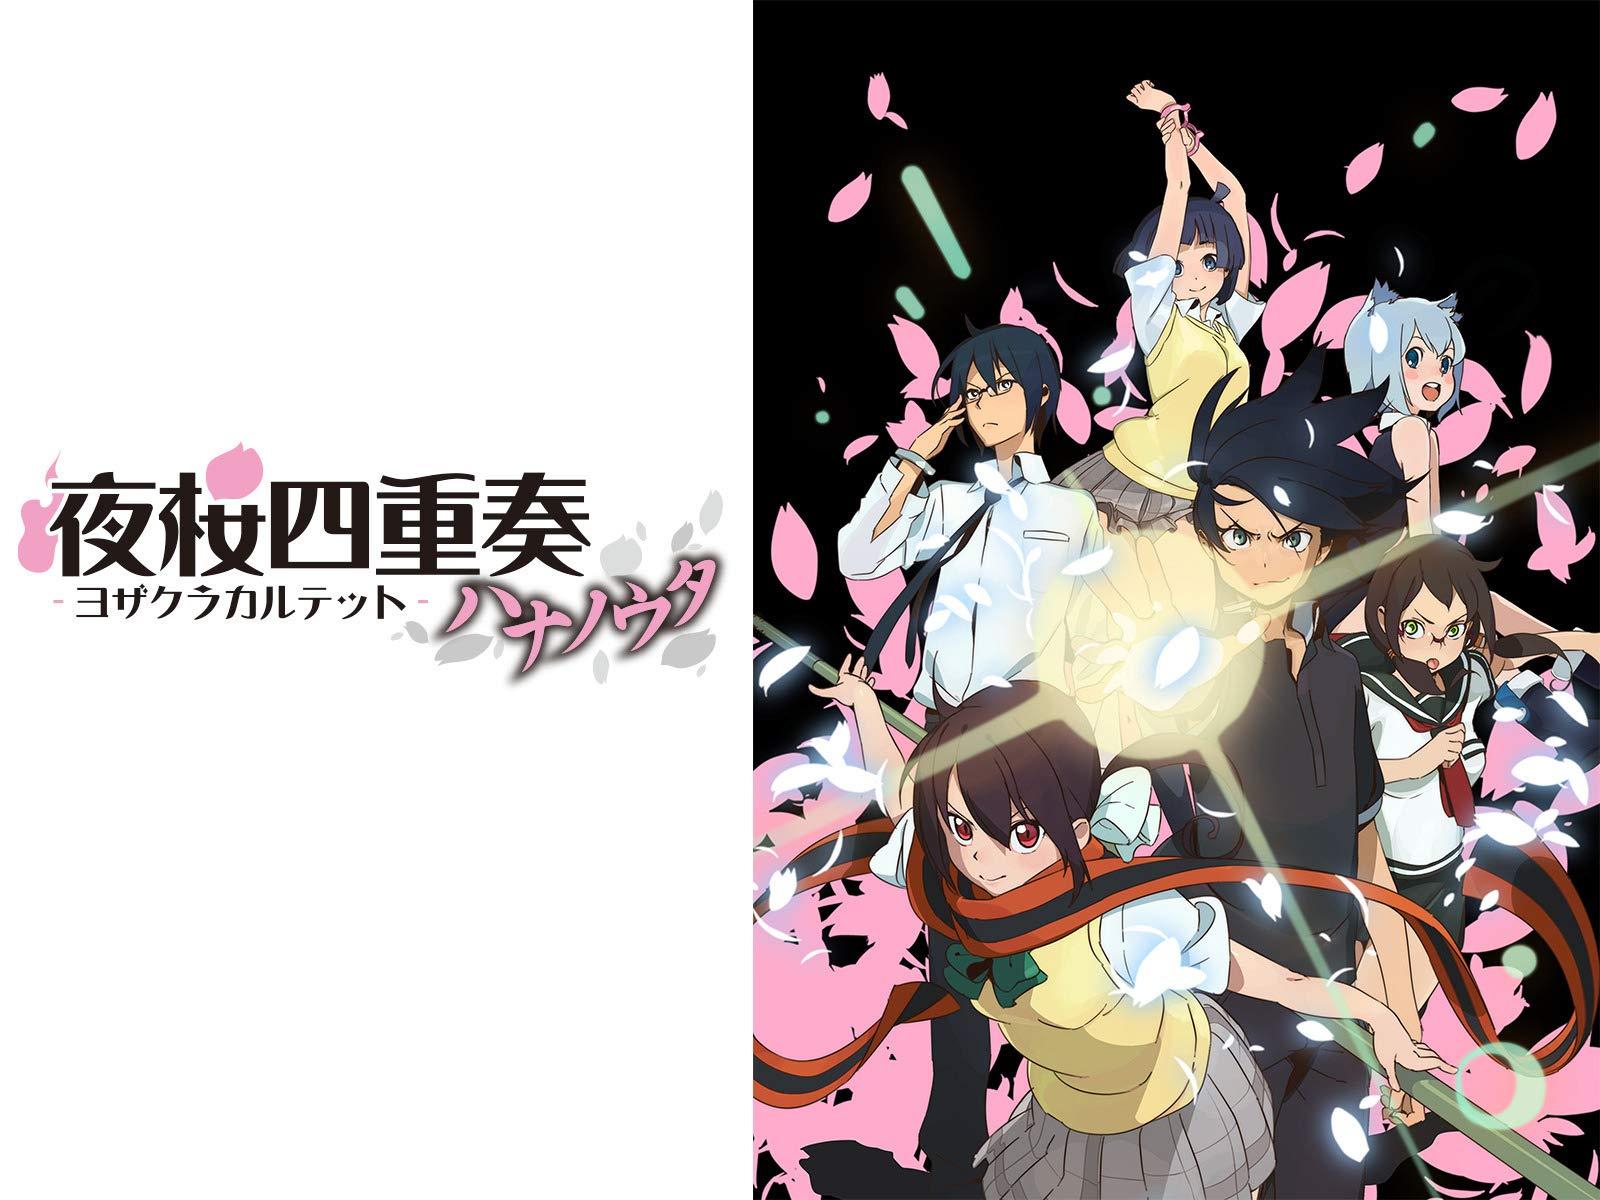 Amazon Co Jp 夜桜四重奏 ハナノウタ を観る Prime Video